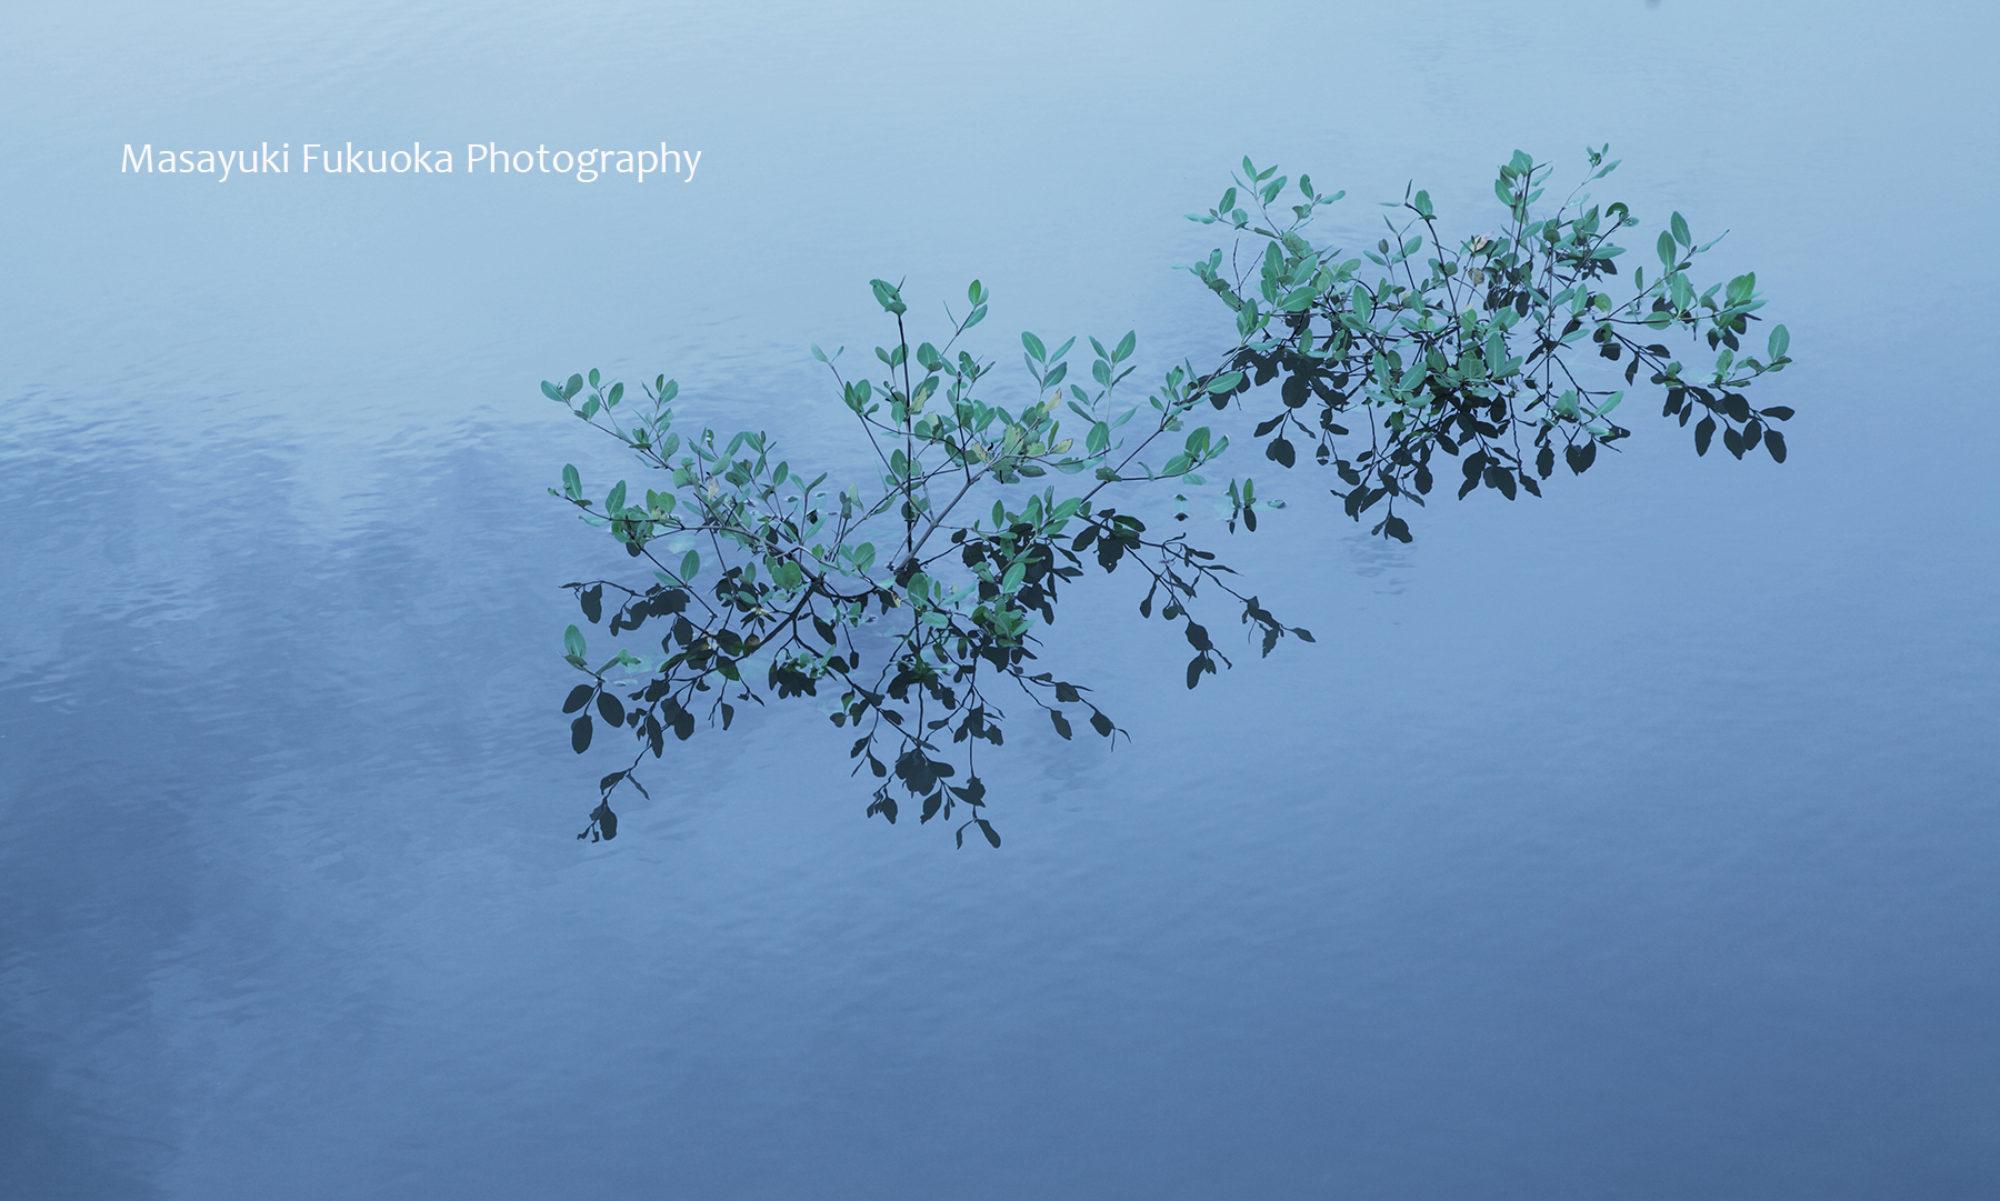 Masayuki Fukuoka Photography / 写真家・福岡将之